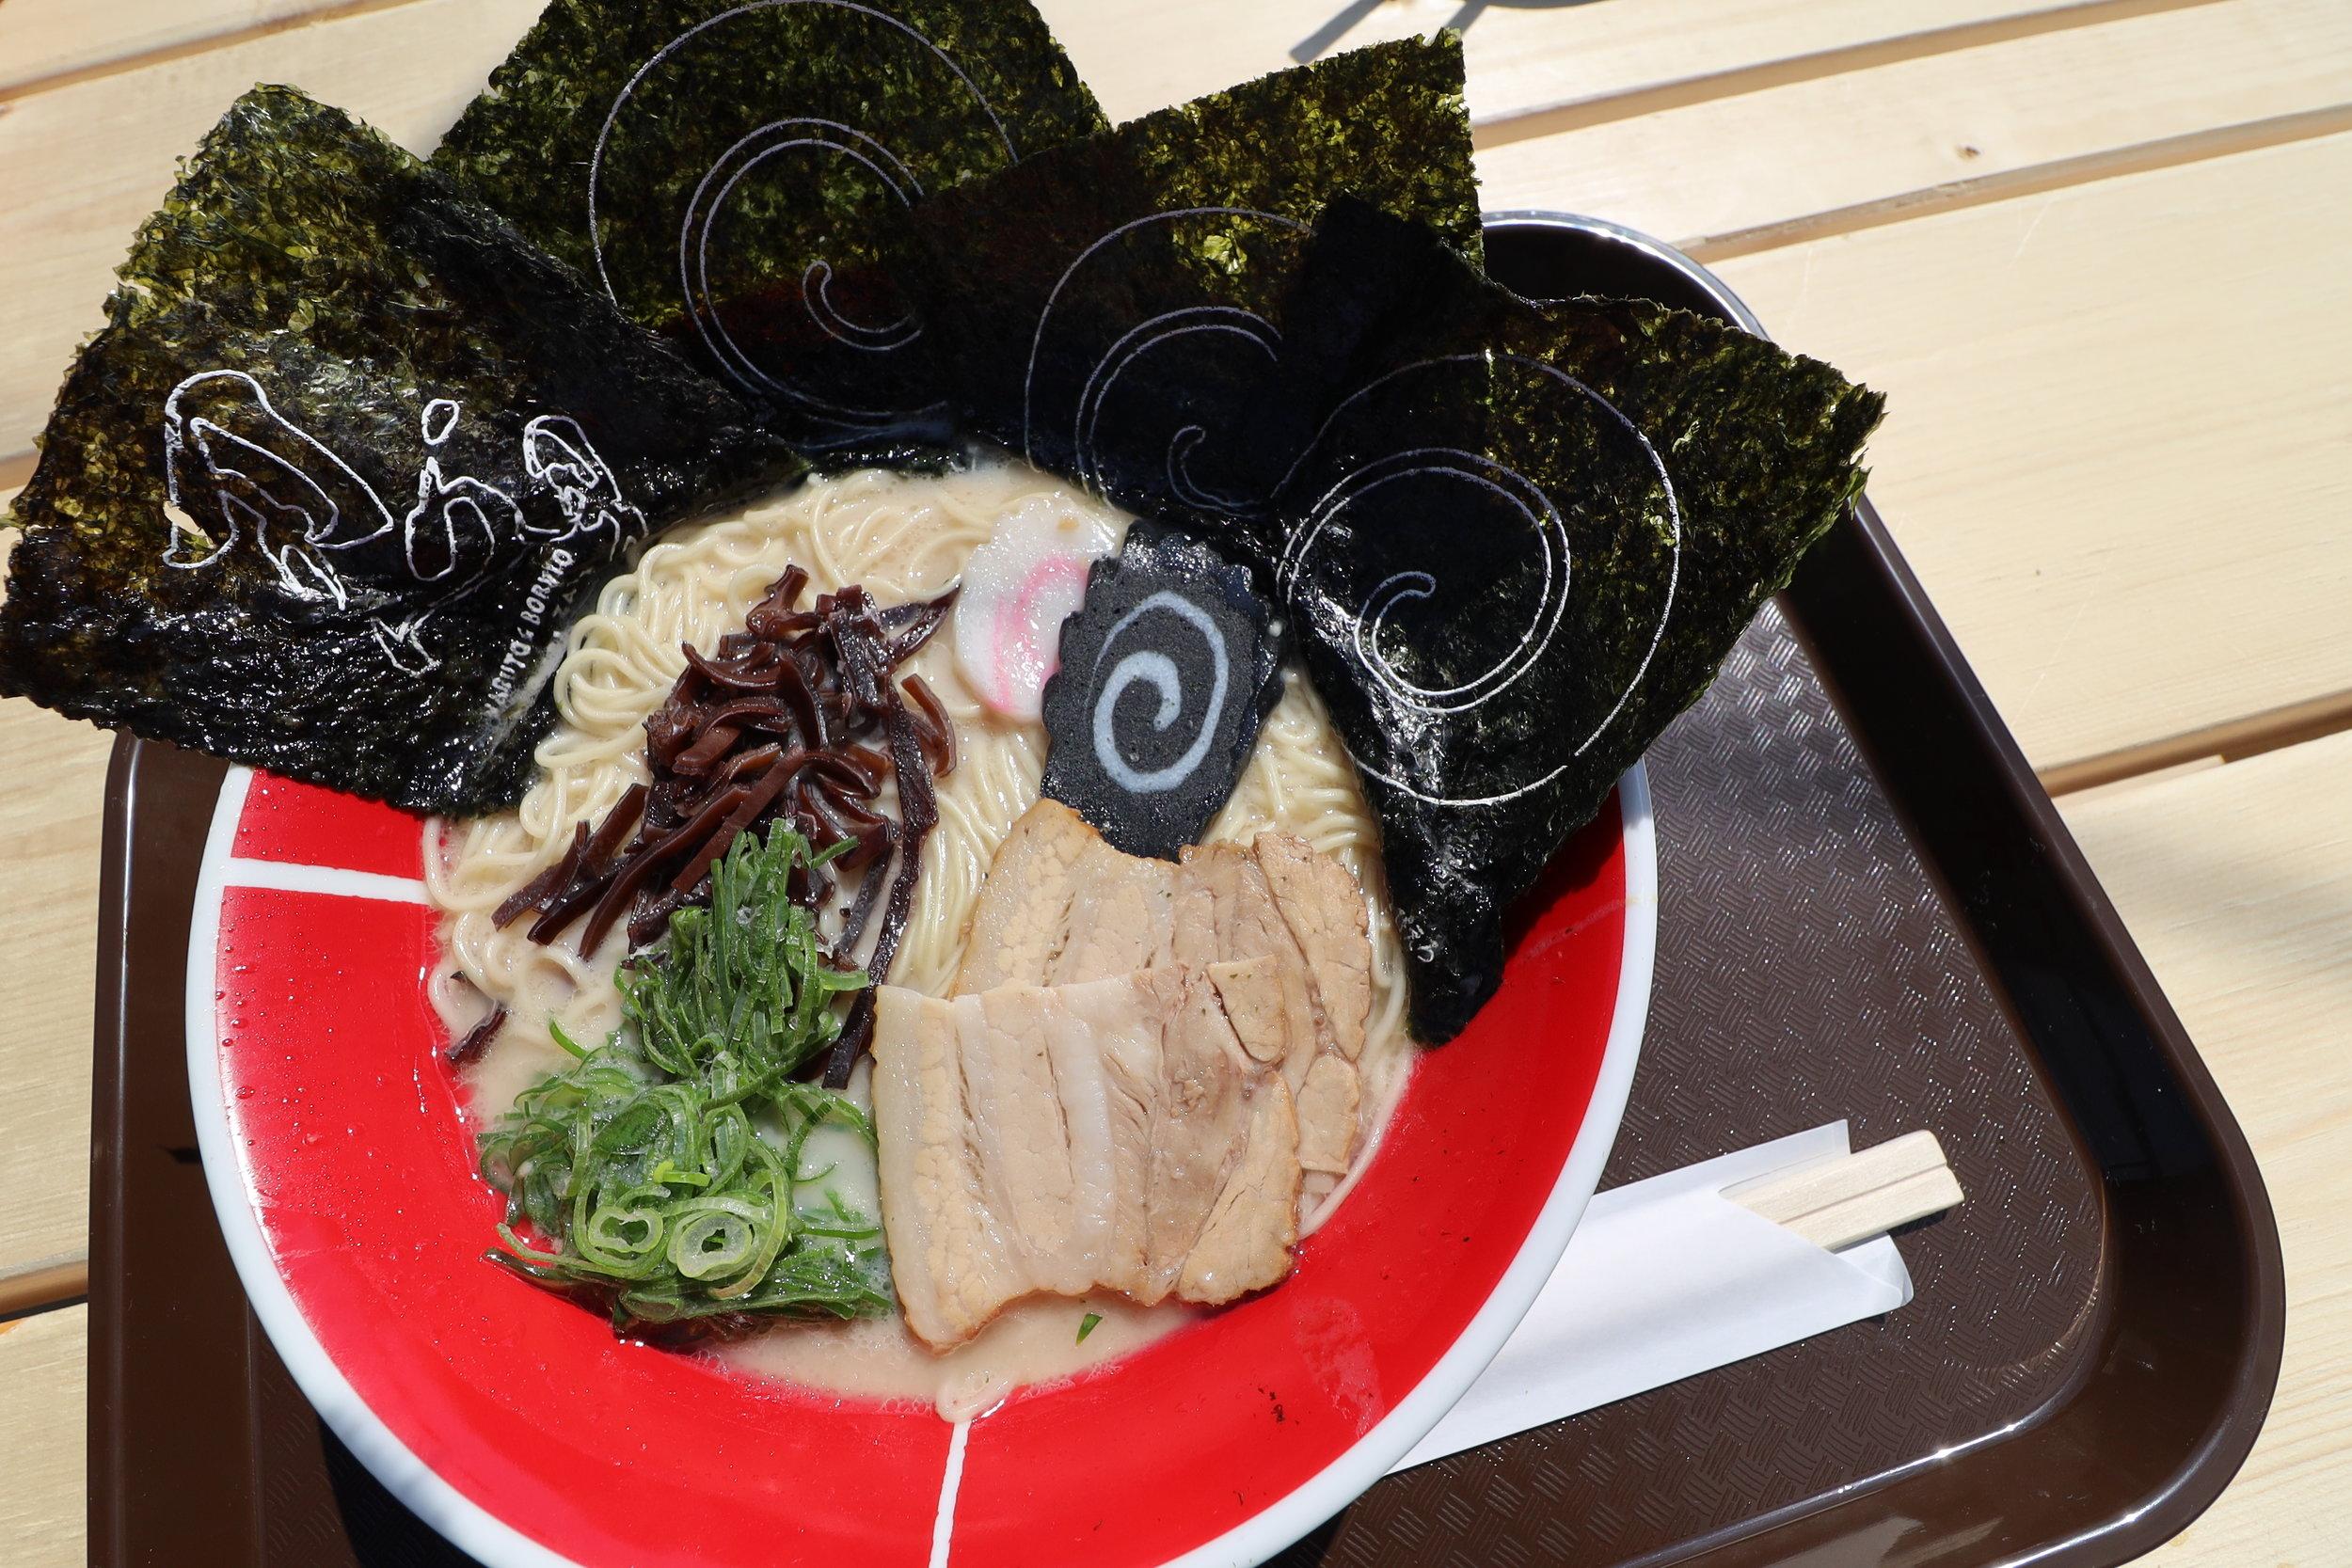 Tonkotsu ramen with extra seaweed toppings